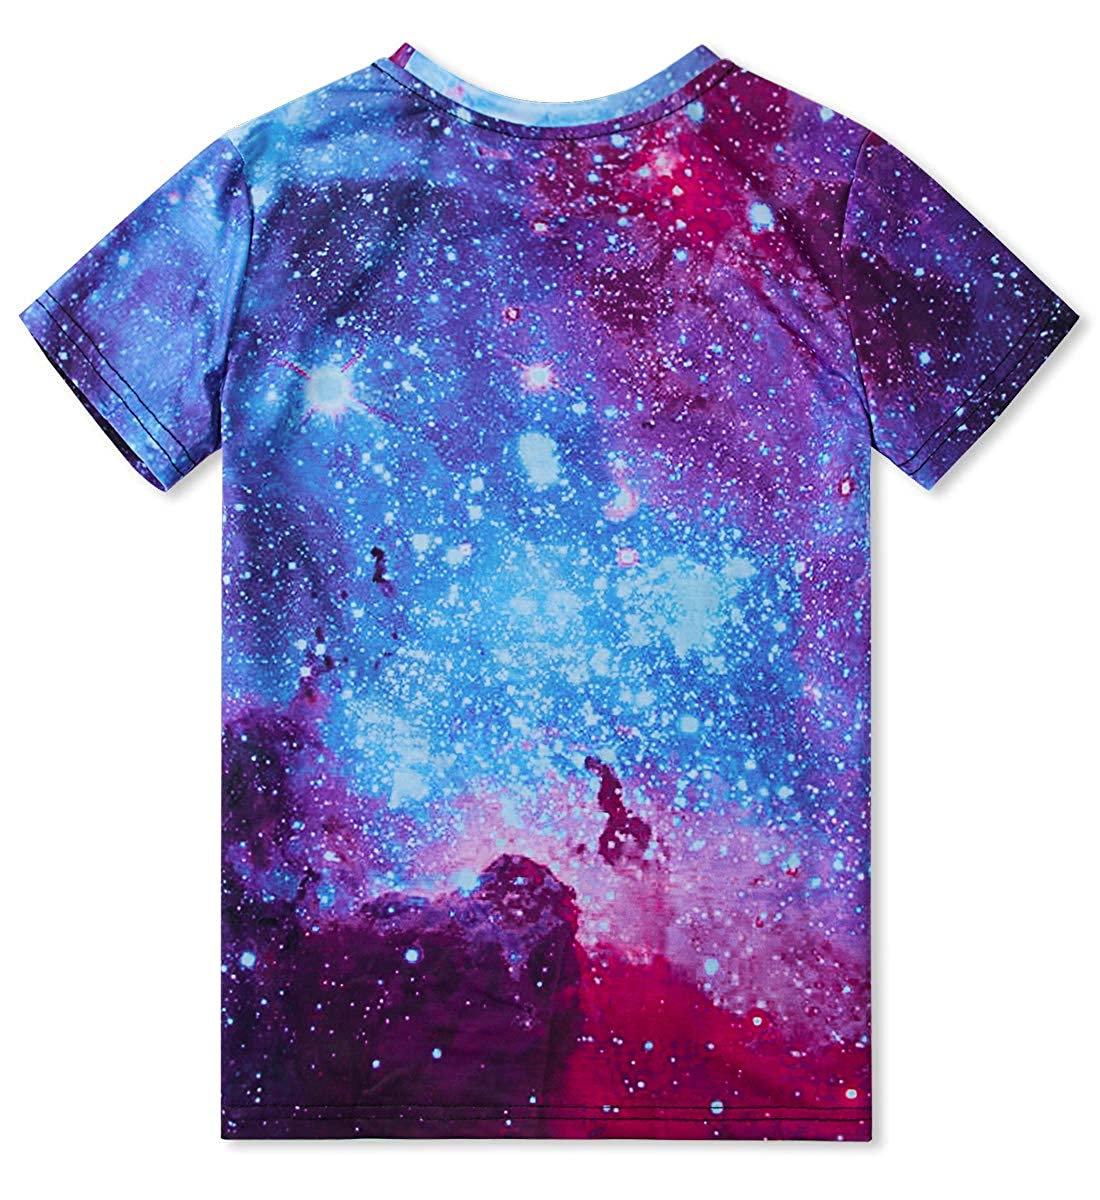 RAISEVERN Unisex Junge M/ädchen 3D Druck Lustige T-Shirt Sommer Casual Kurzarm Shirt Coole Crew Tees Top 6-16T